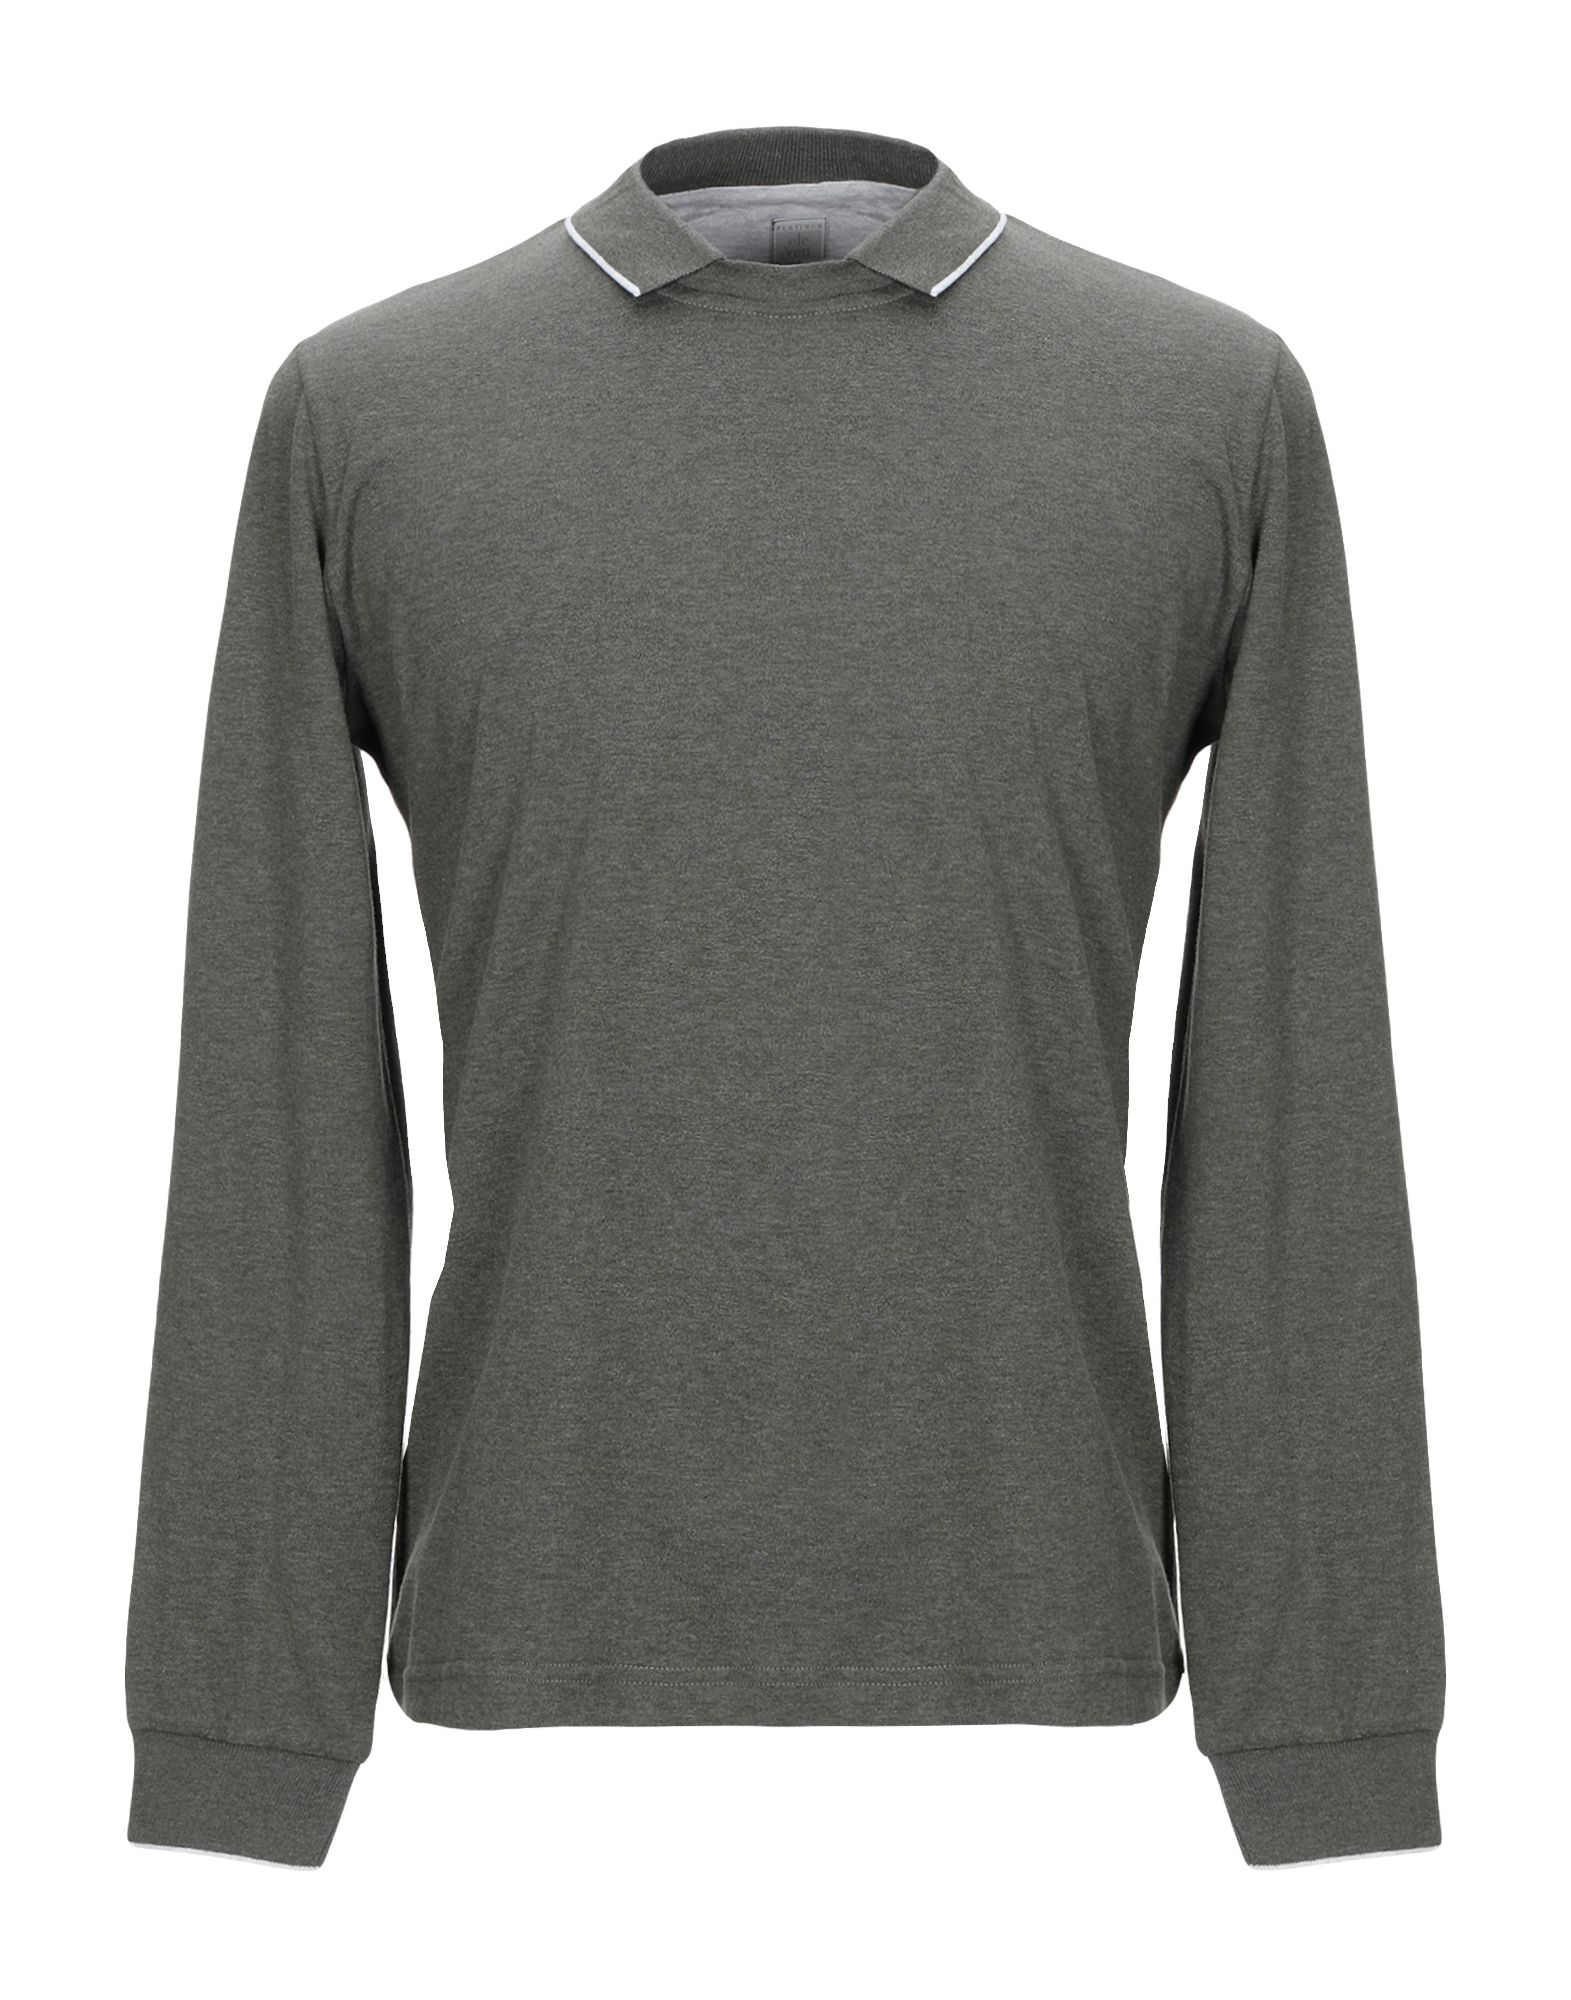 Фото - ELEVENTY Свитер eleventy серый трикотажный свитер